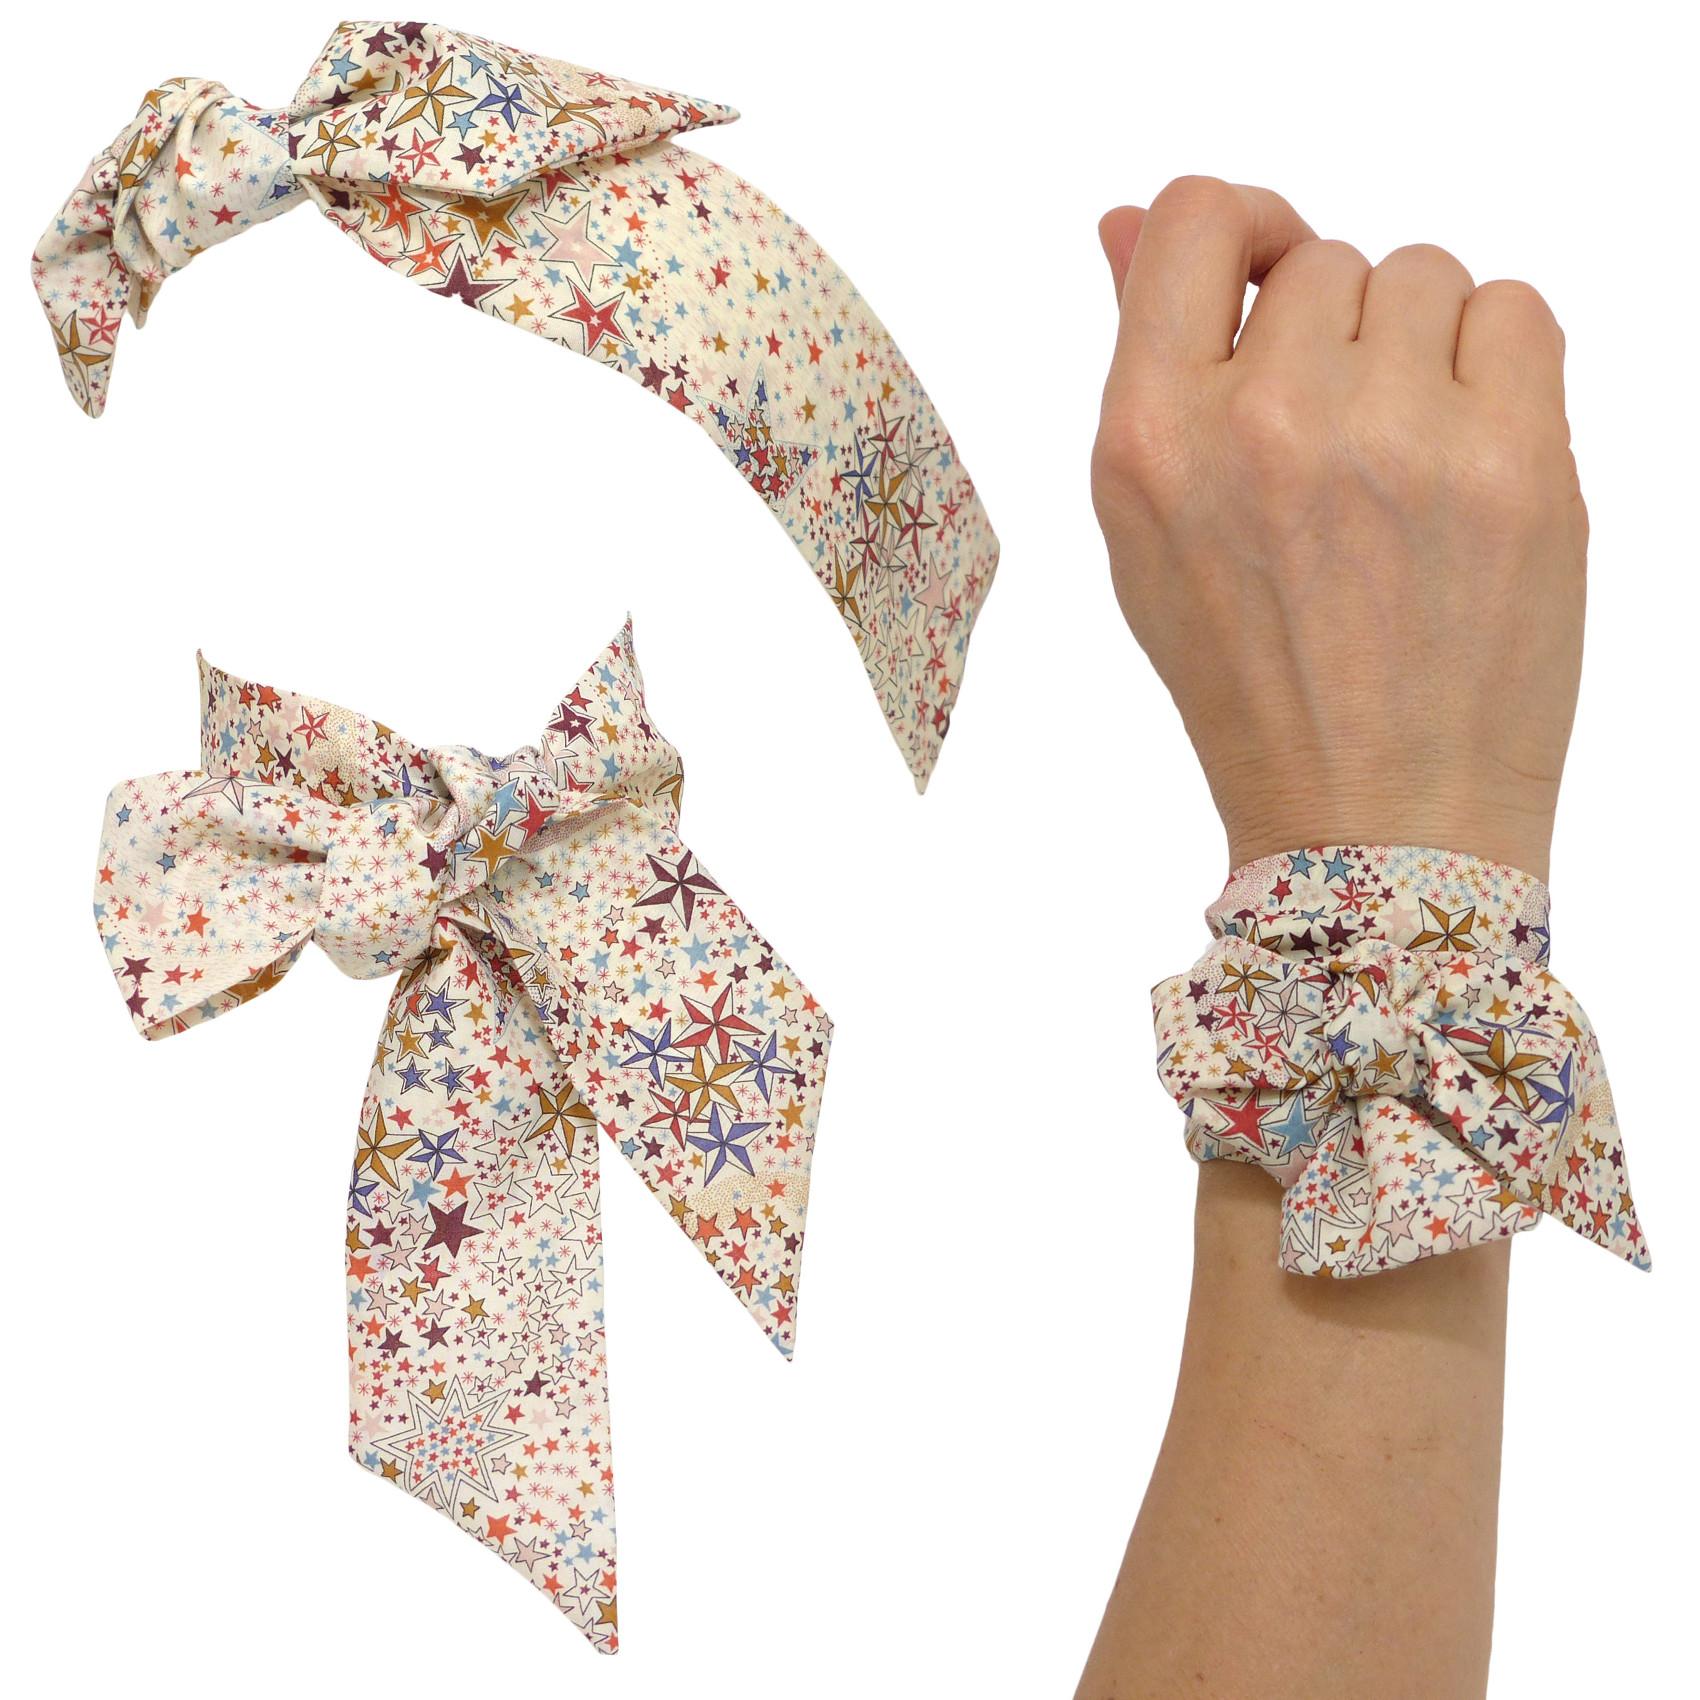 foulard   bandeau cheveux à nouer femme   fille, tissu Liberty, motif  étoiles Adelajda b552ddde353